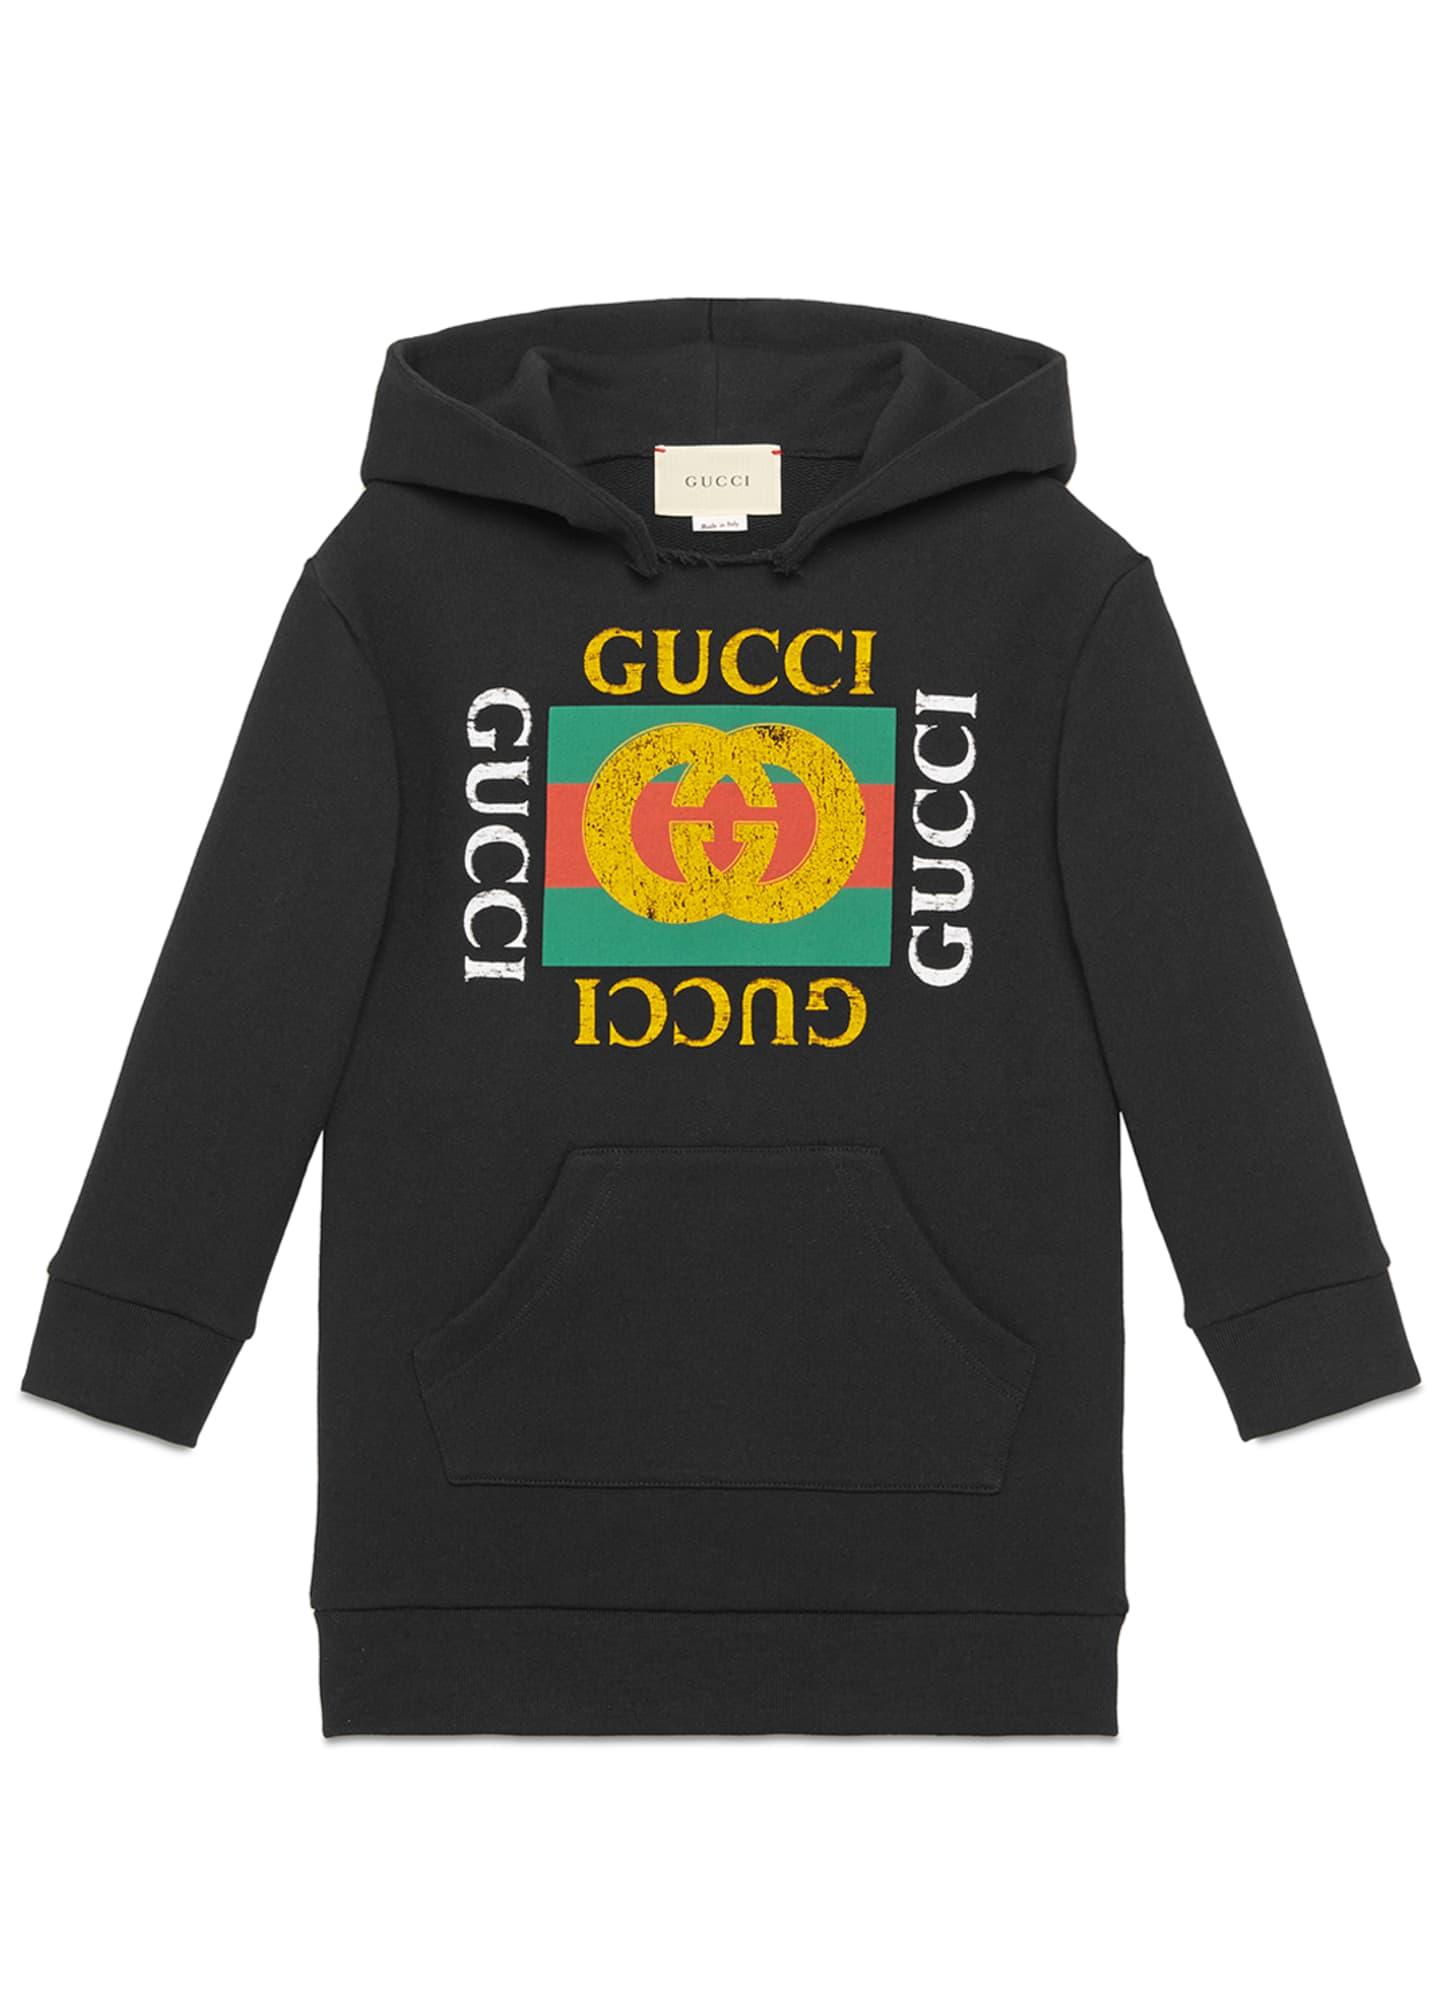 Gucci Hooded Sweatshirt Dress w/ Vintage Logo, Size